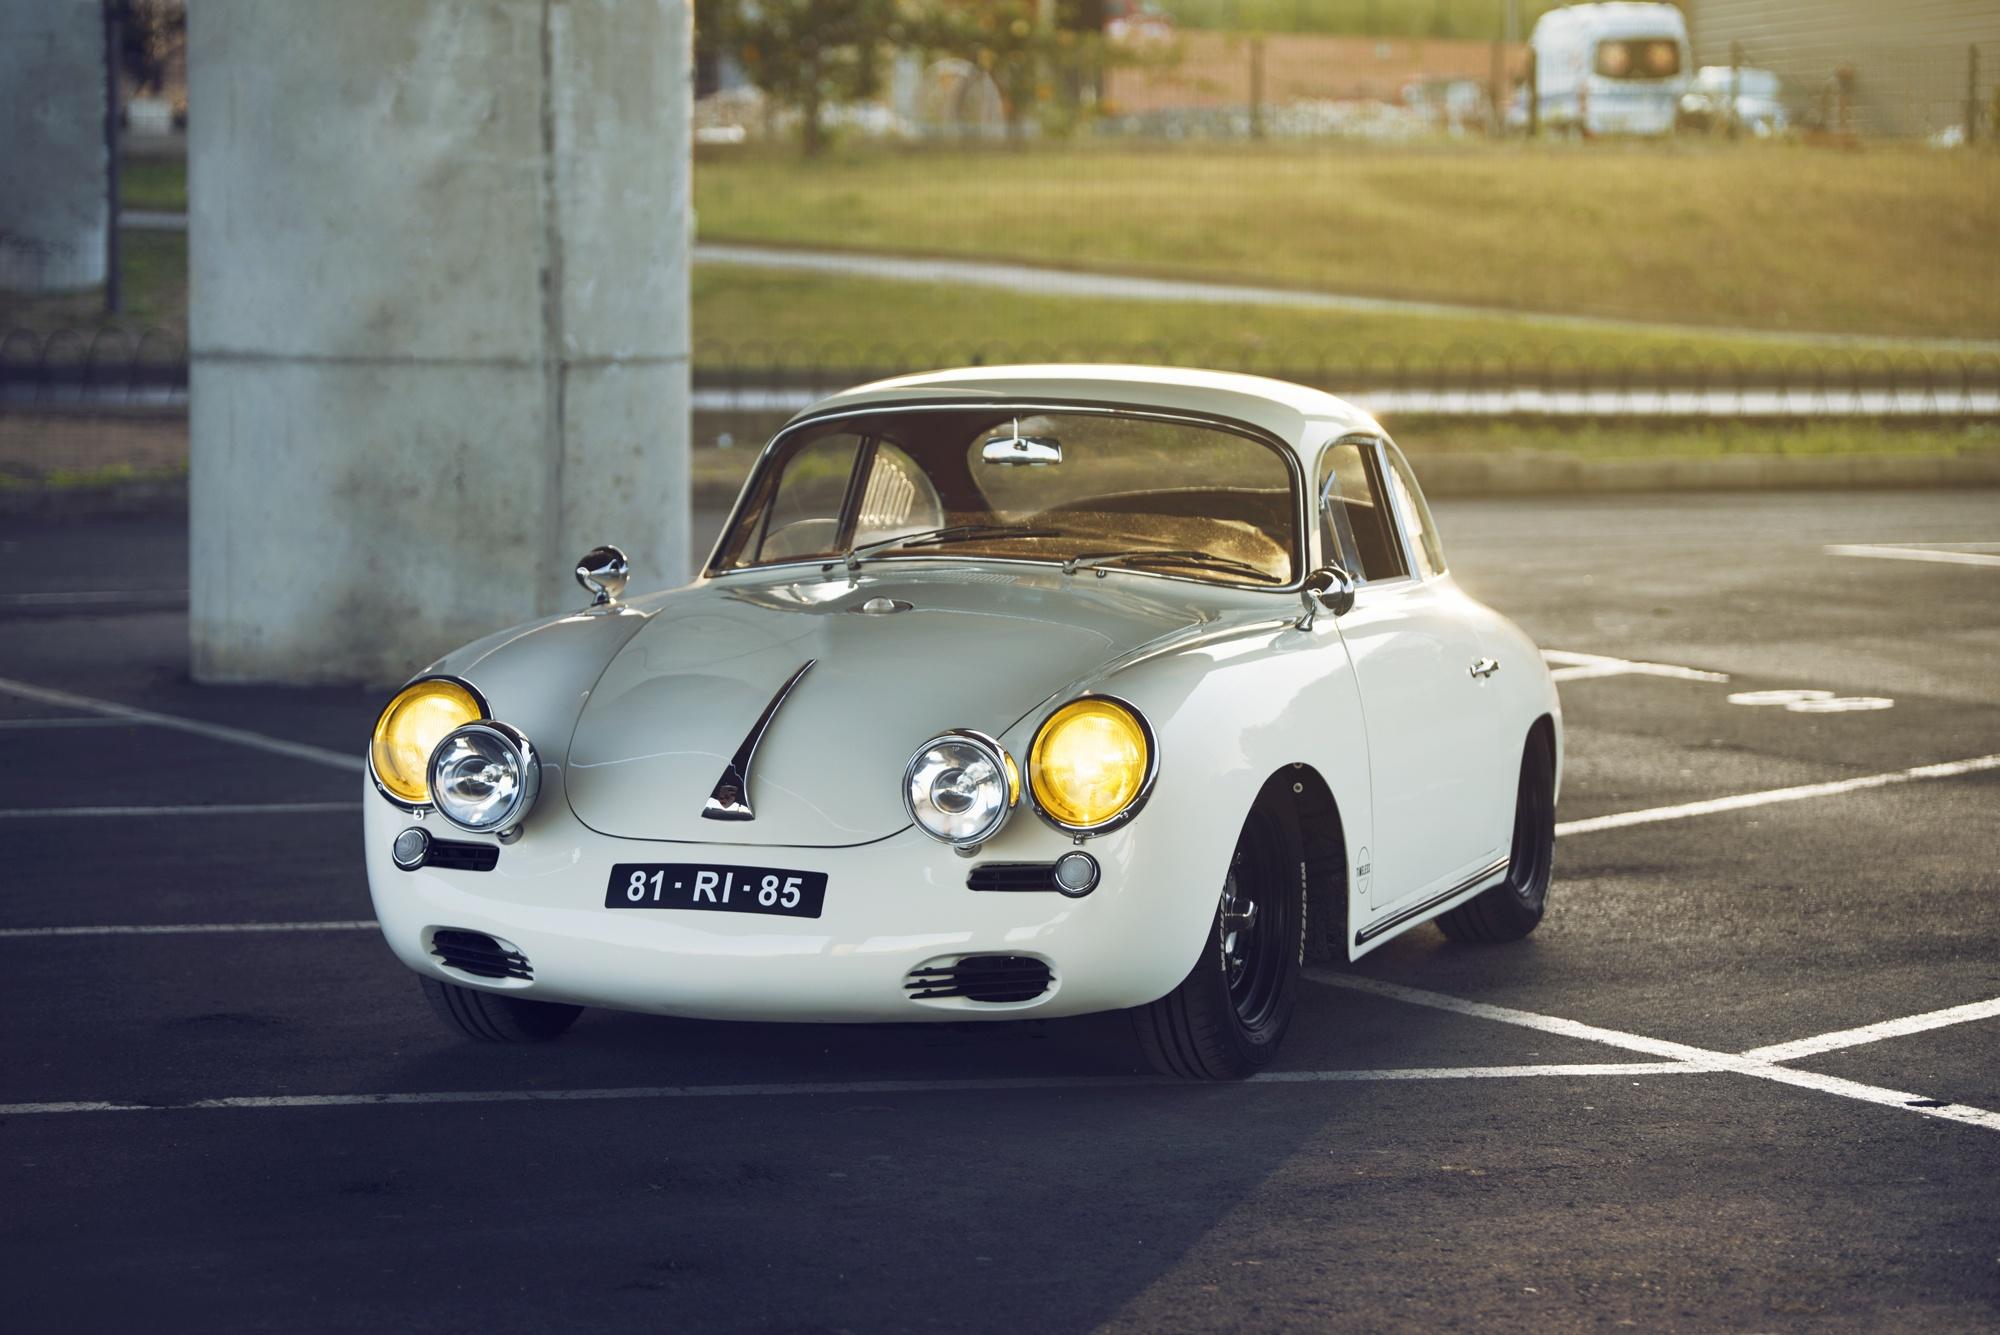 1962 Porsche 356 B 1600 Outlaw Classic Driver Market